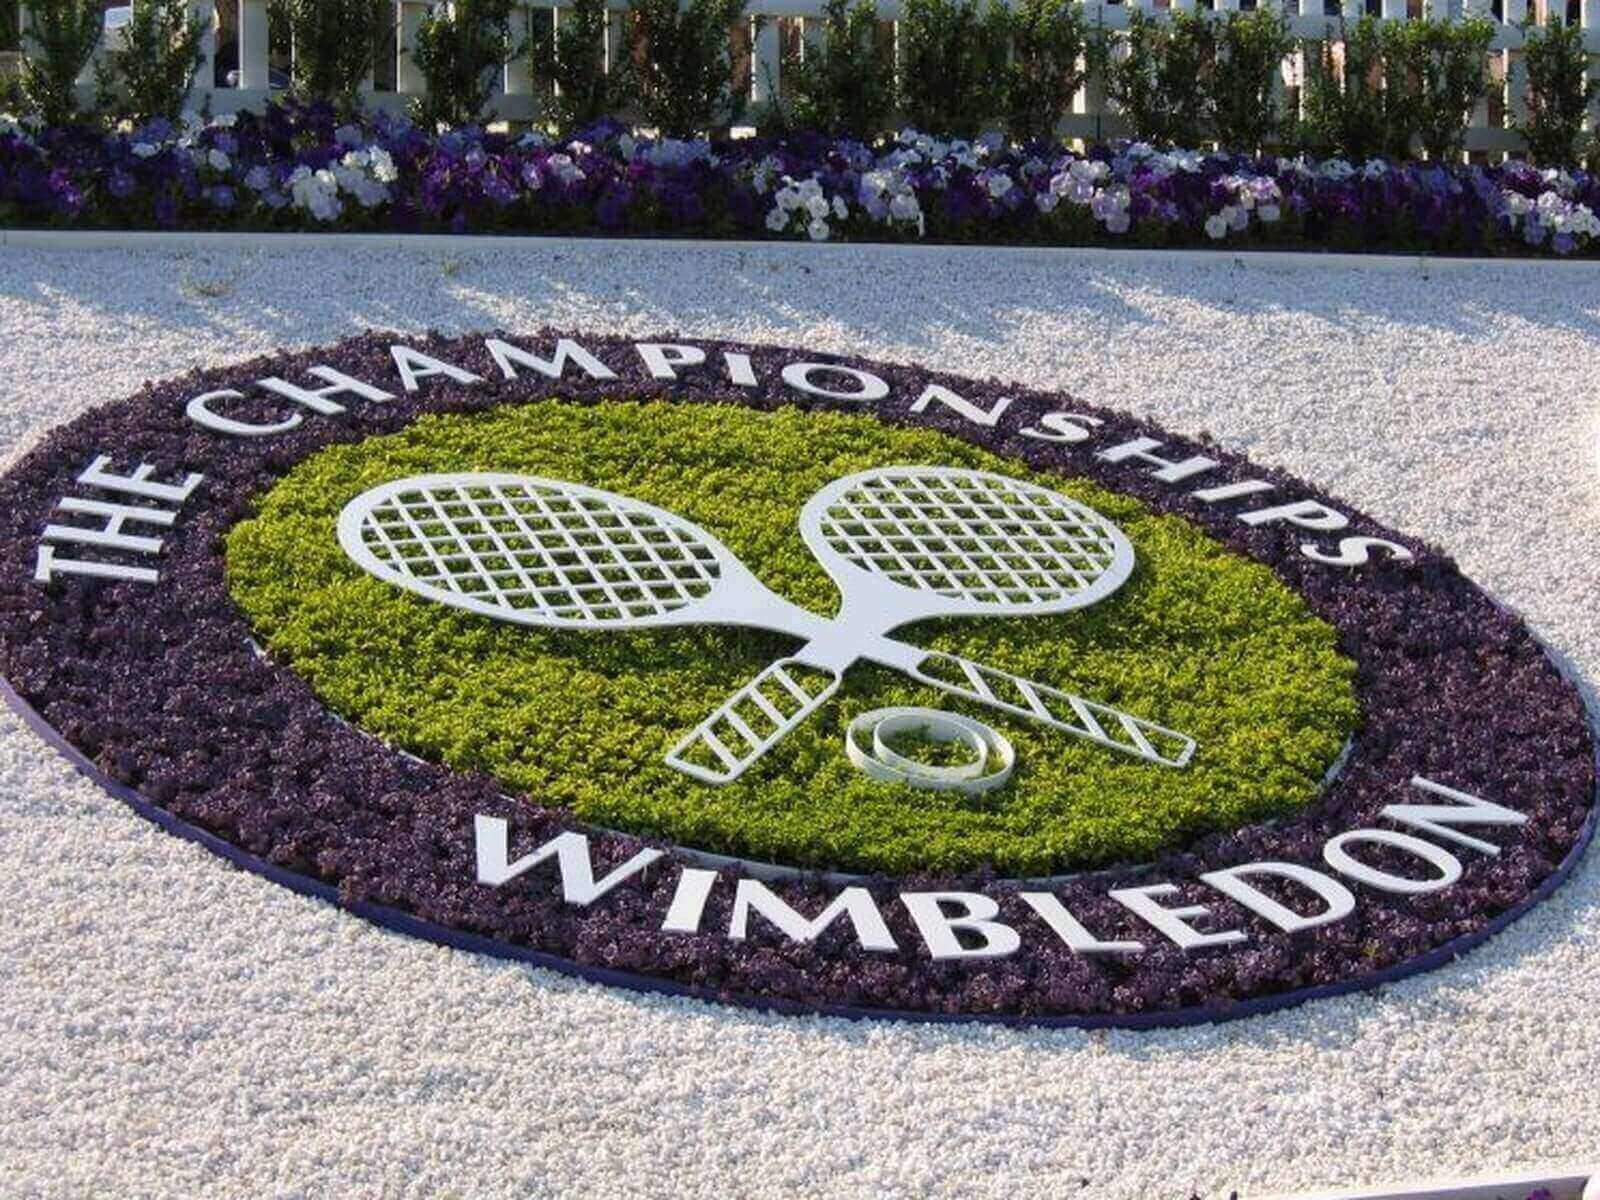 Wimbledon Events 2019